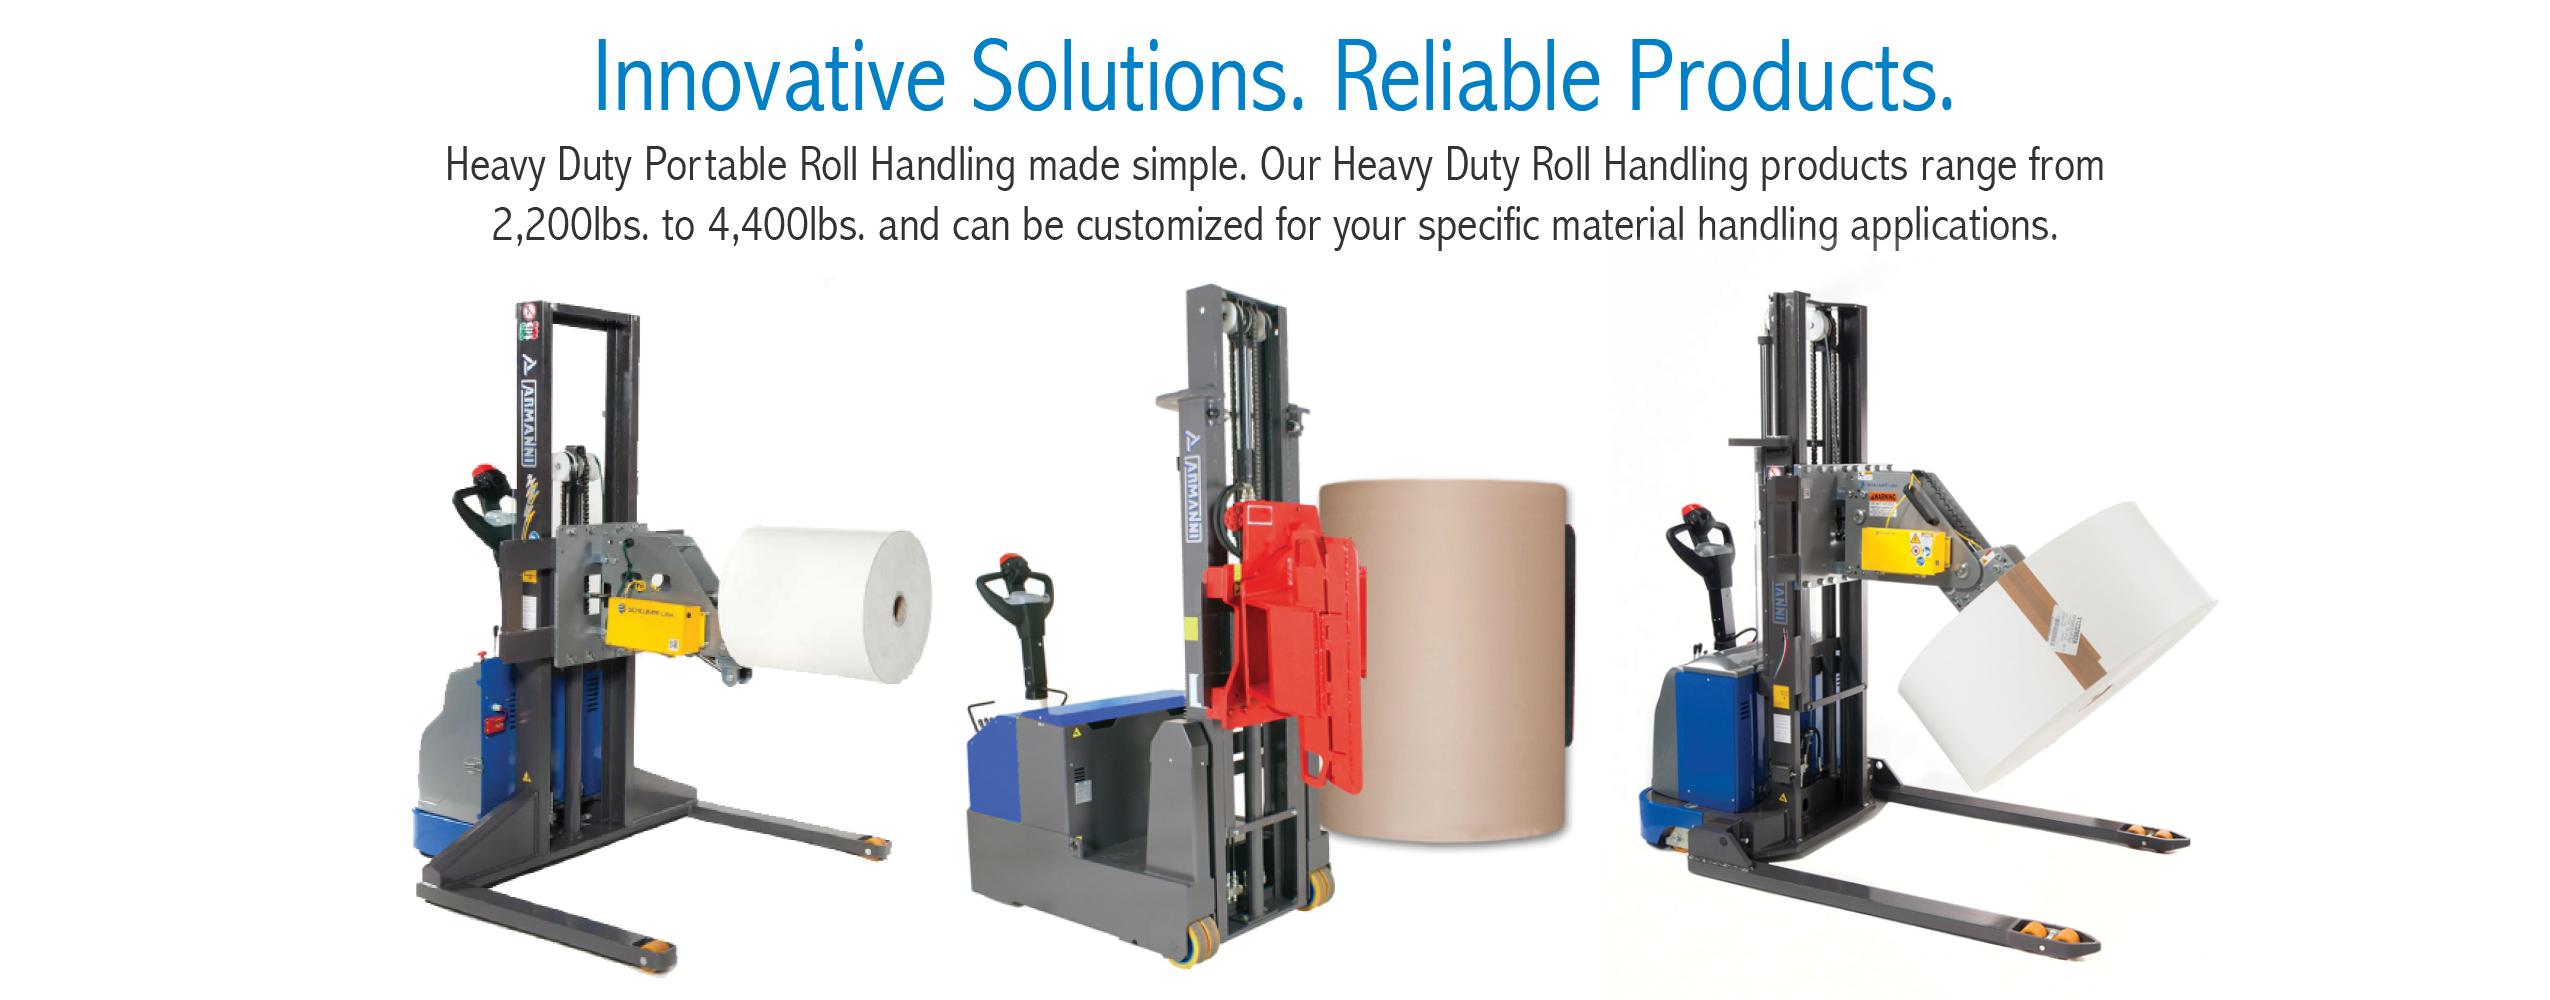 Heavy Duty Portable Roll Handling Solutions